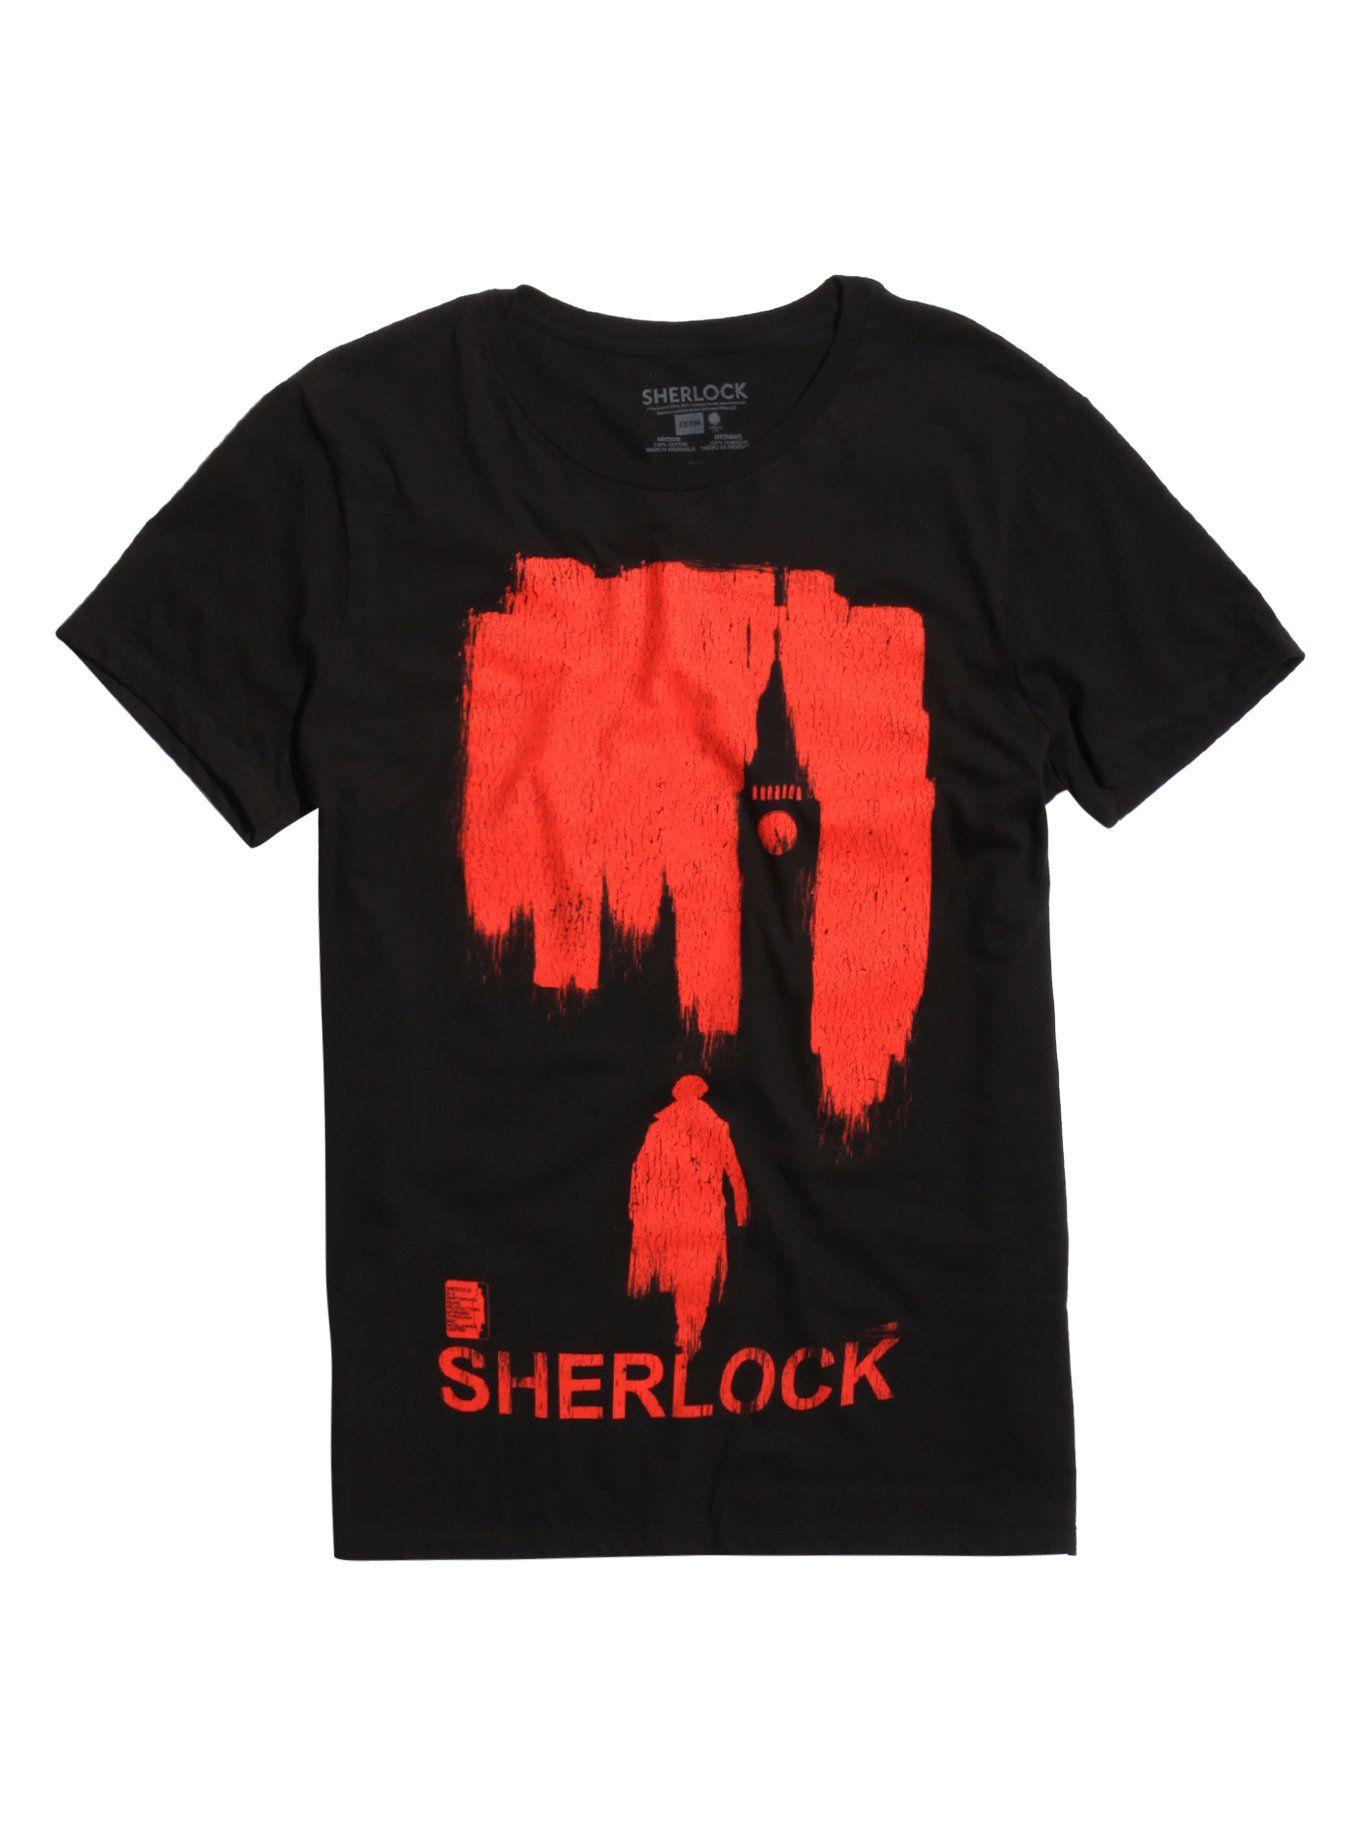 Sherlock Red London TShirt Sherlock, T shirt, London shirts